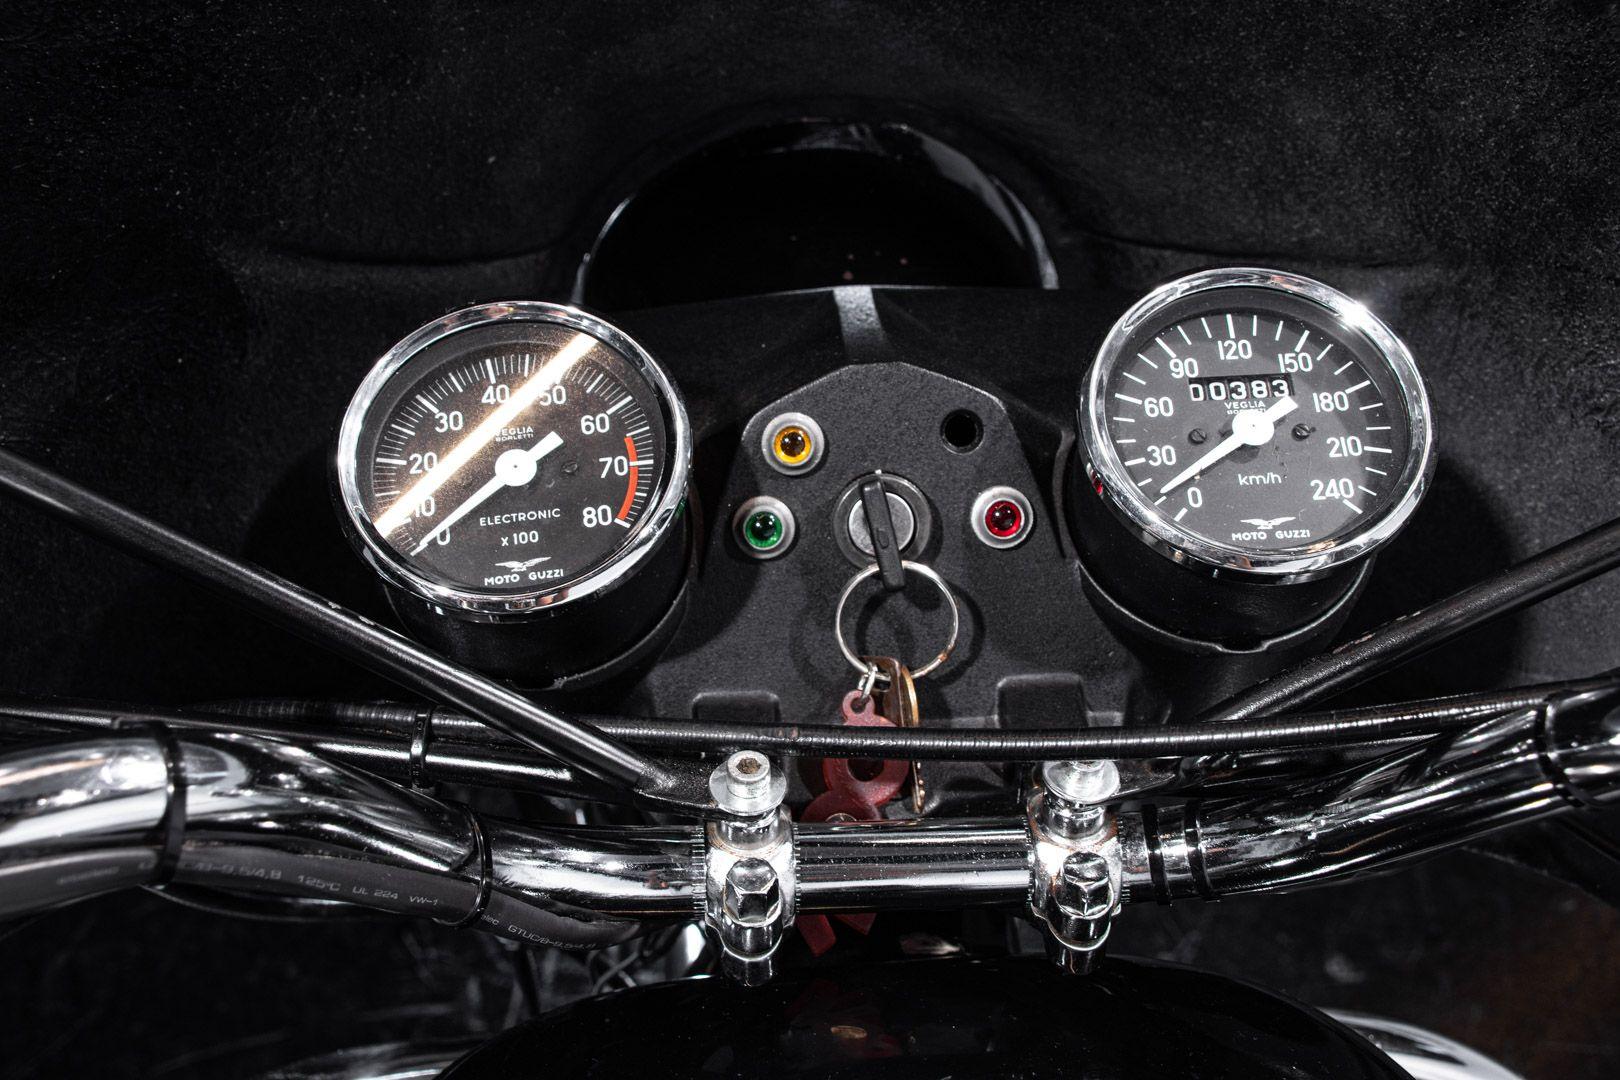 1969 Moto Guzzi V7 Special 81487